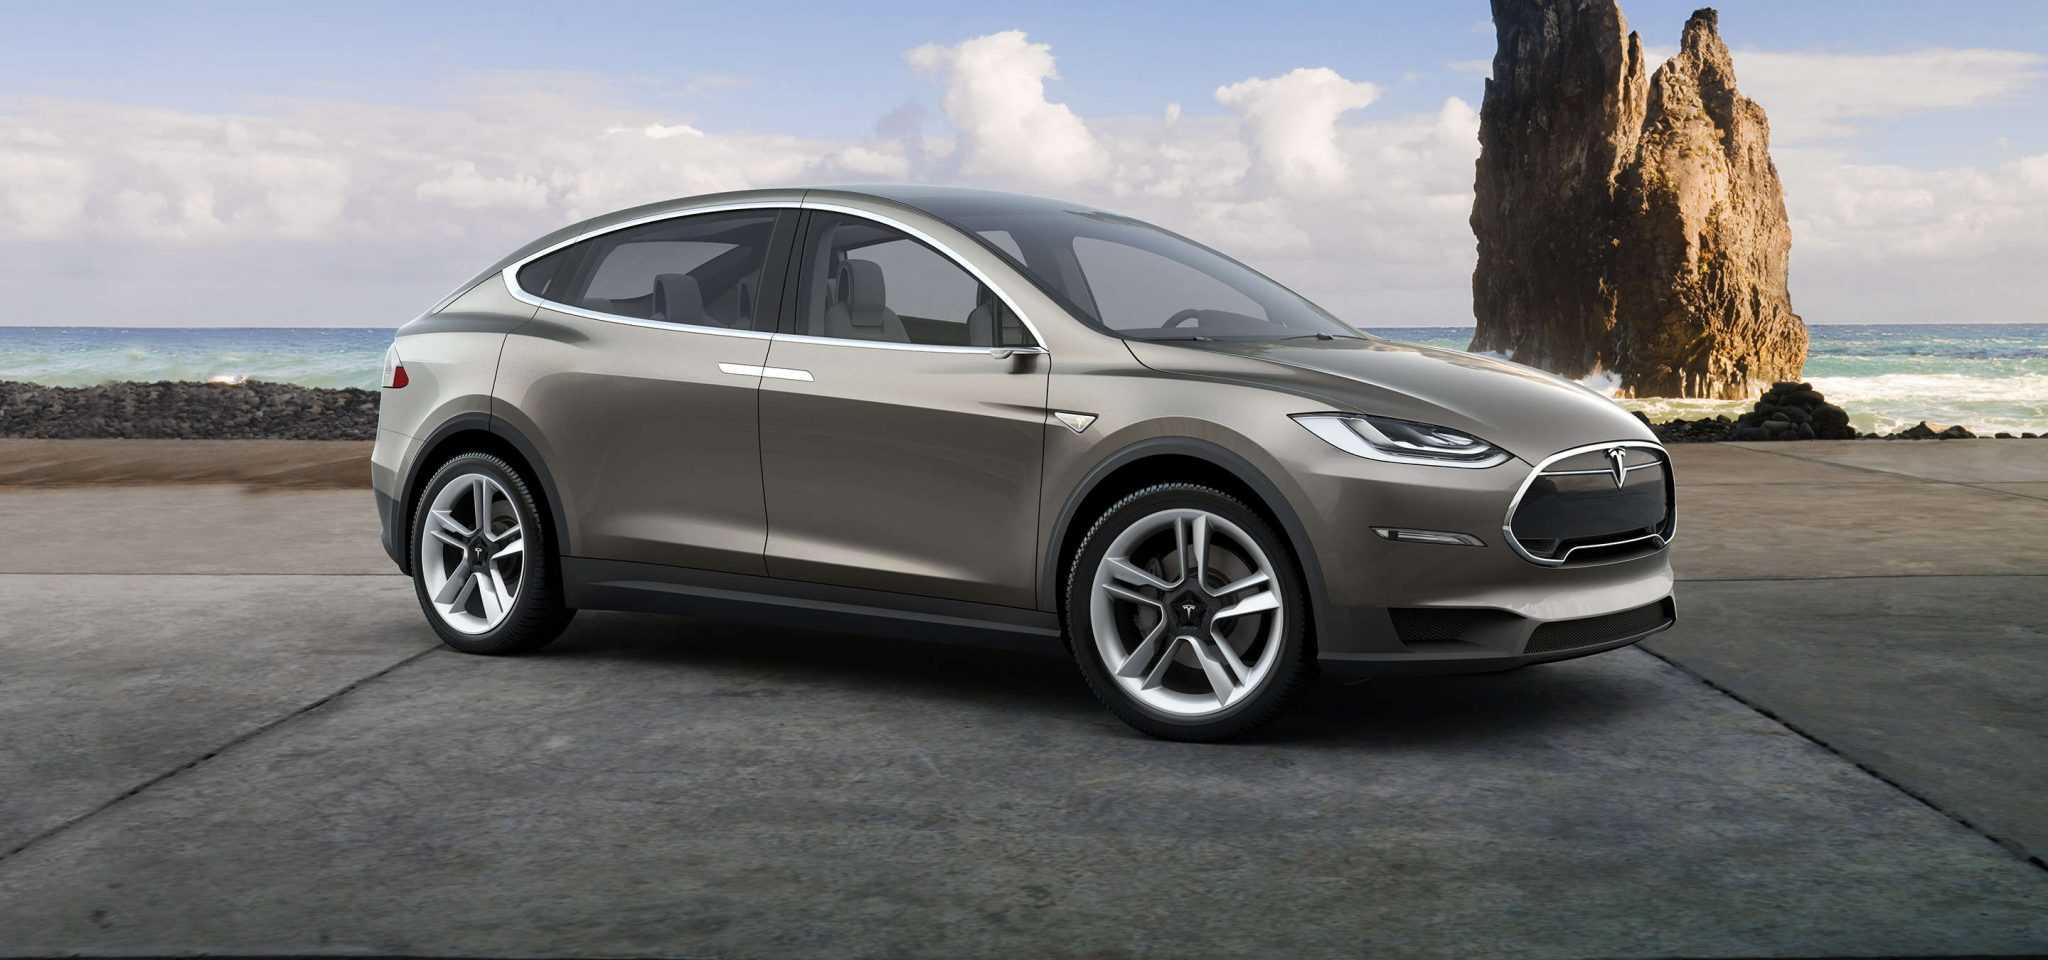 Tesla Model X Release Date Confirmed as September 30 2015